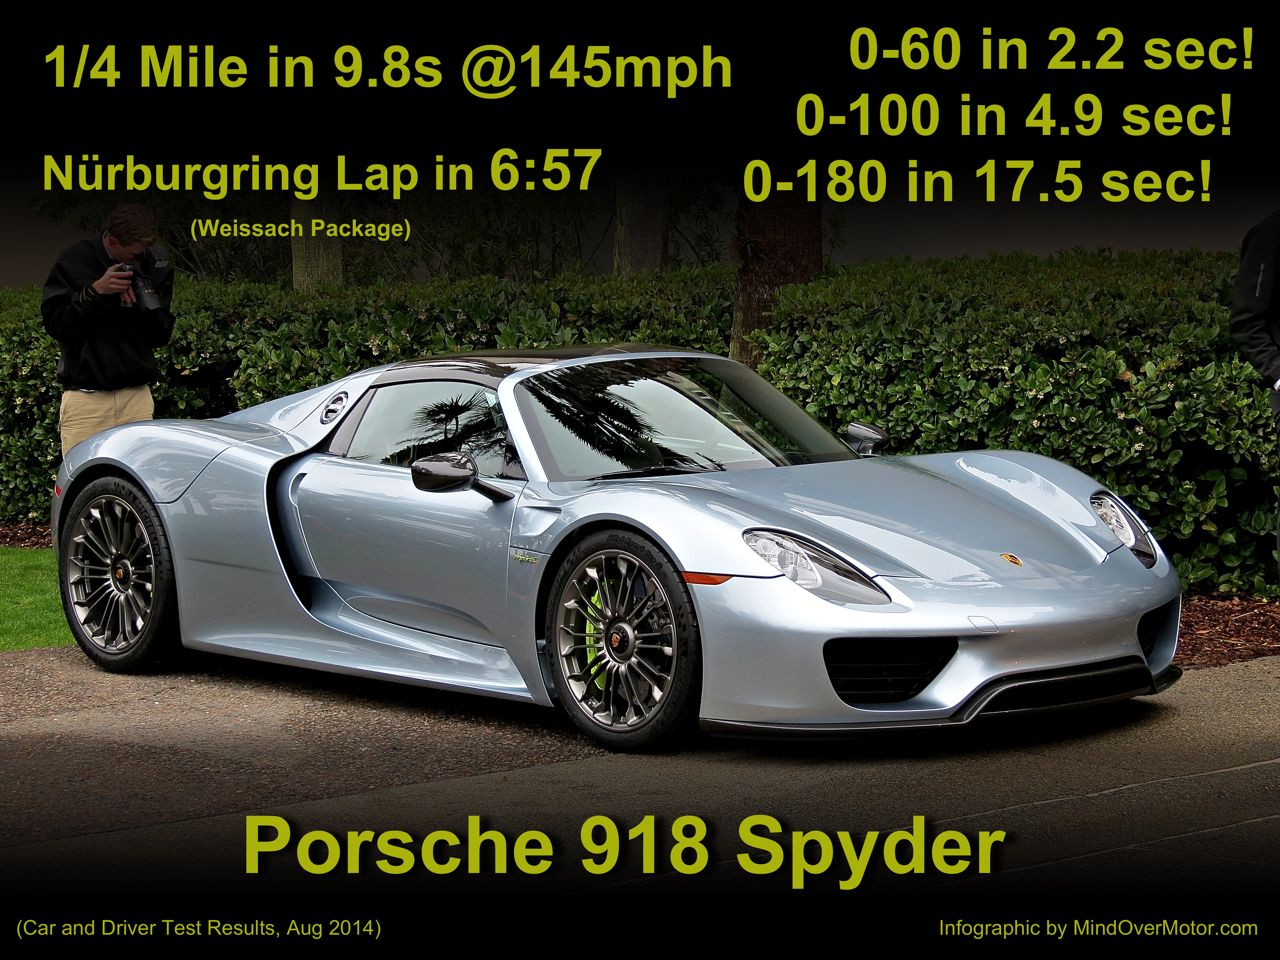 Porsche 918 Spyder Performance Specs